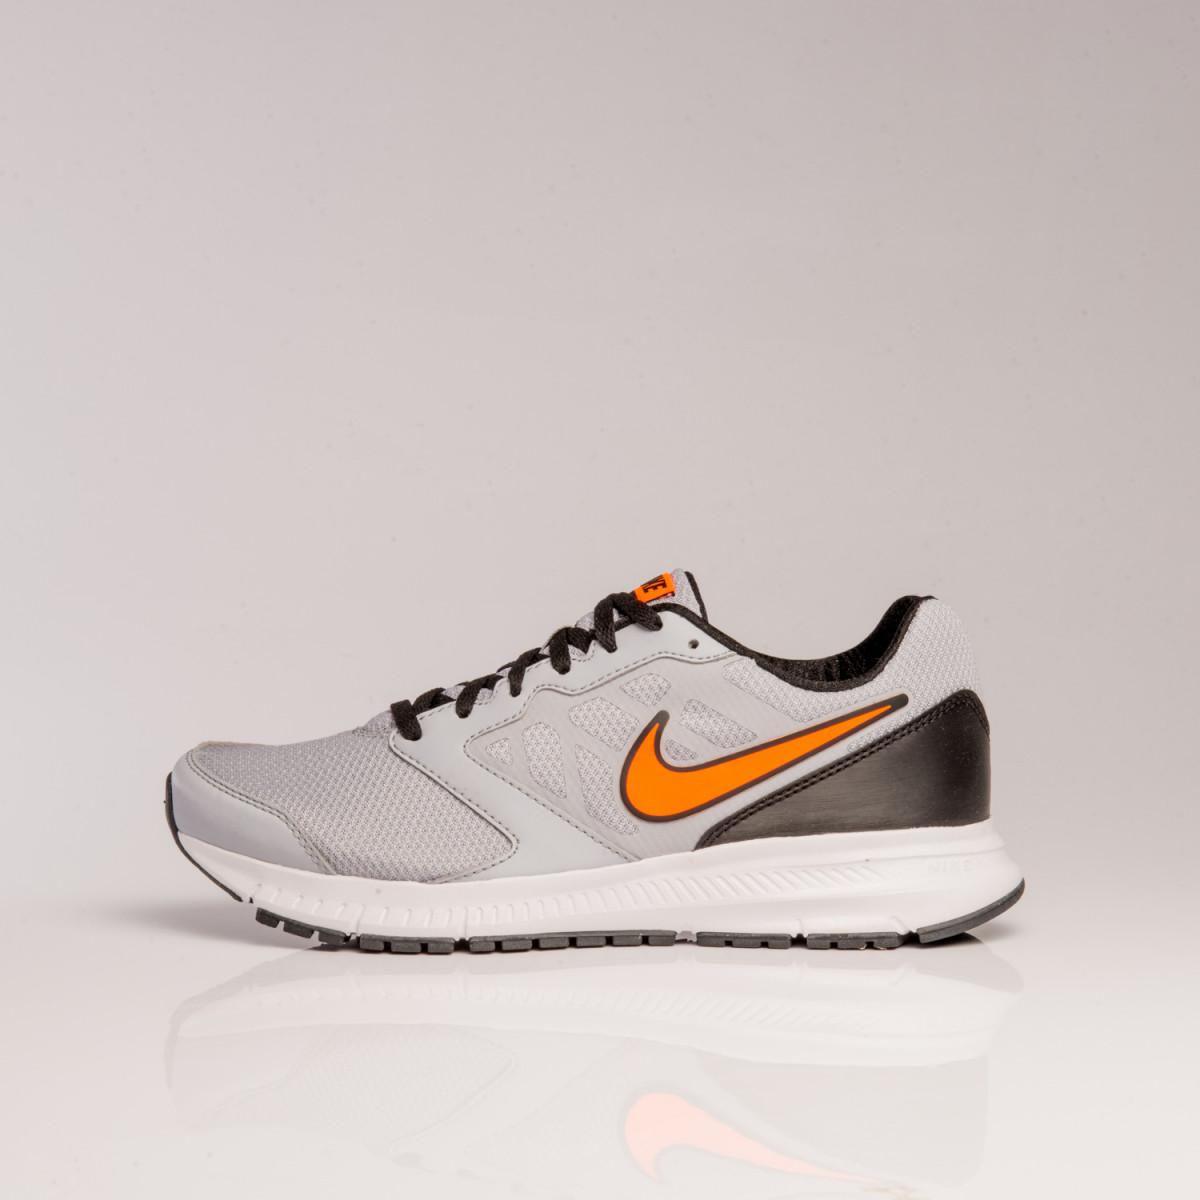 Zapatillas Nike Downshifter 6 Msl